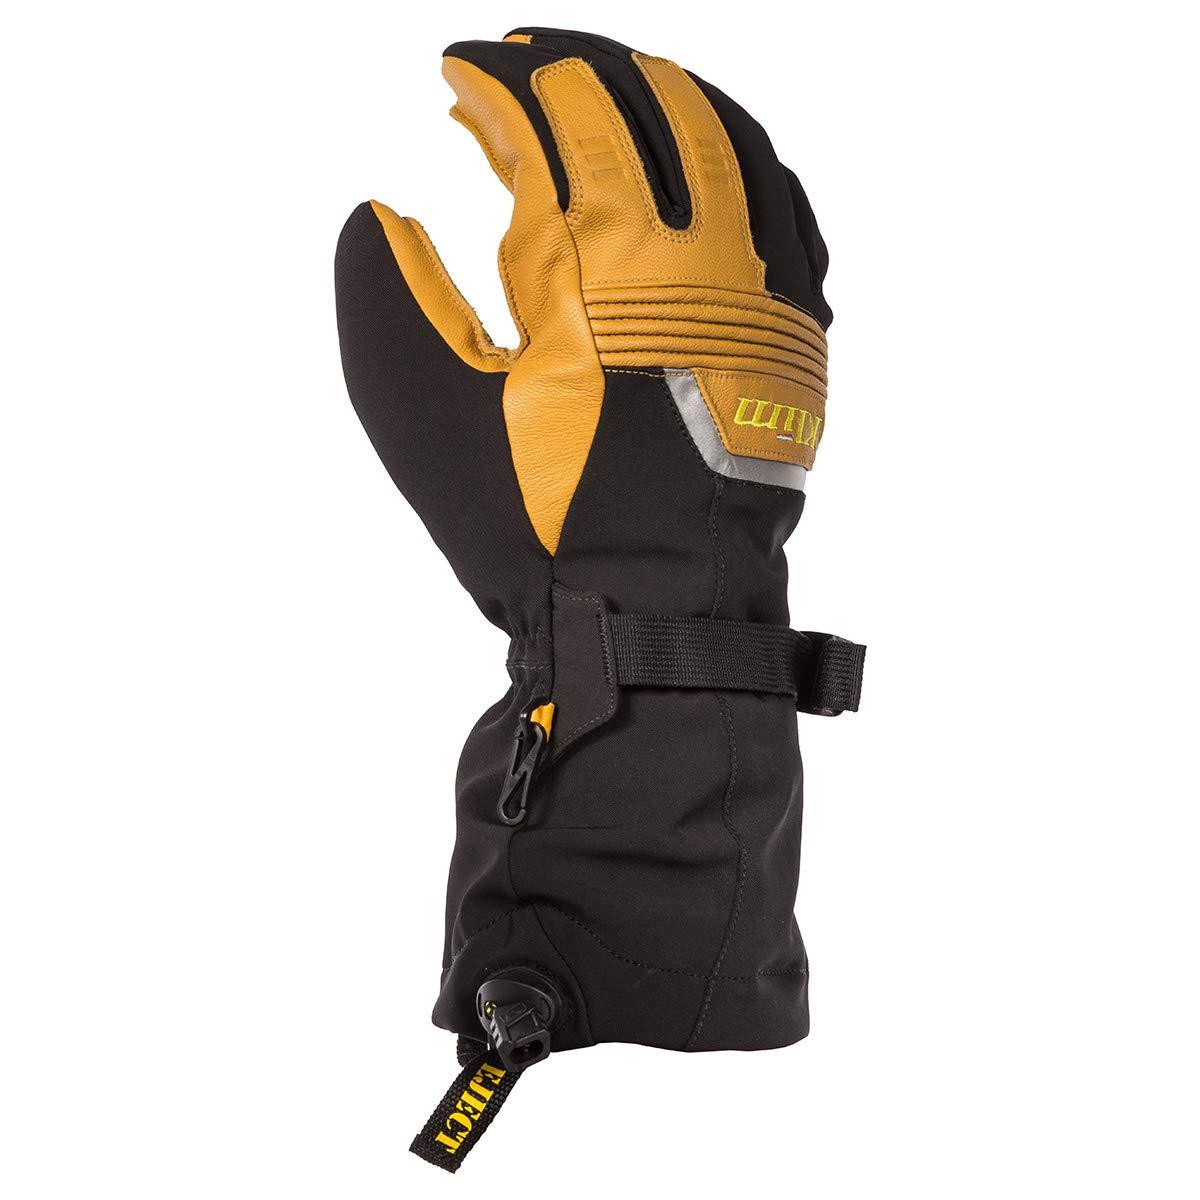 KLIM Fusion Glove SM Black 3087-001-120-000